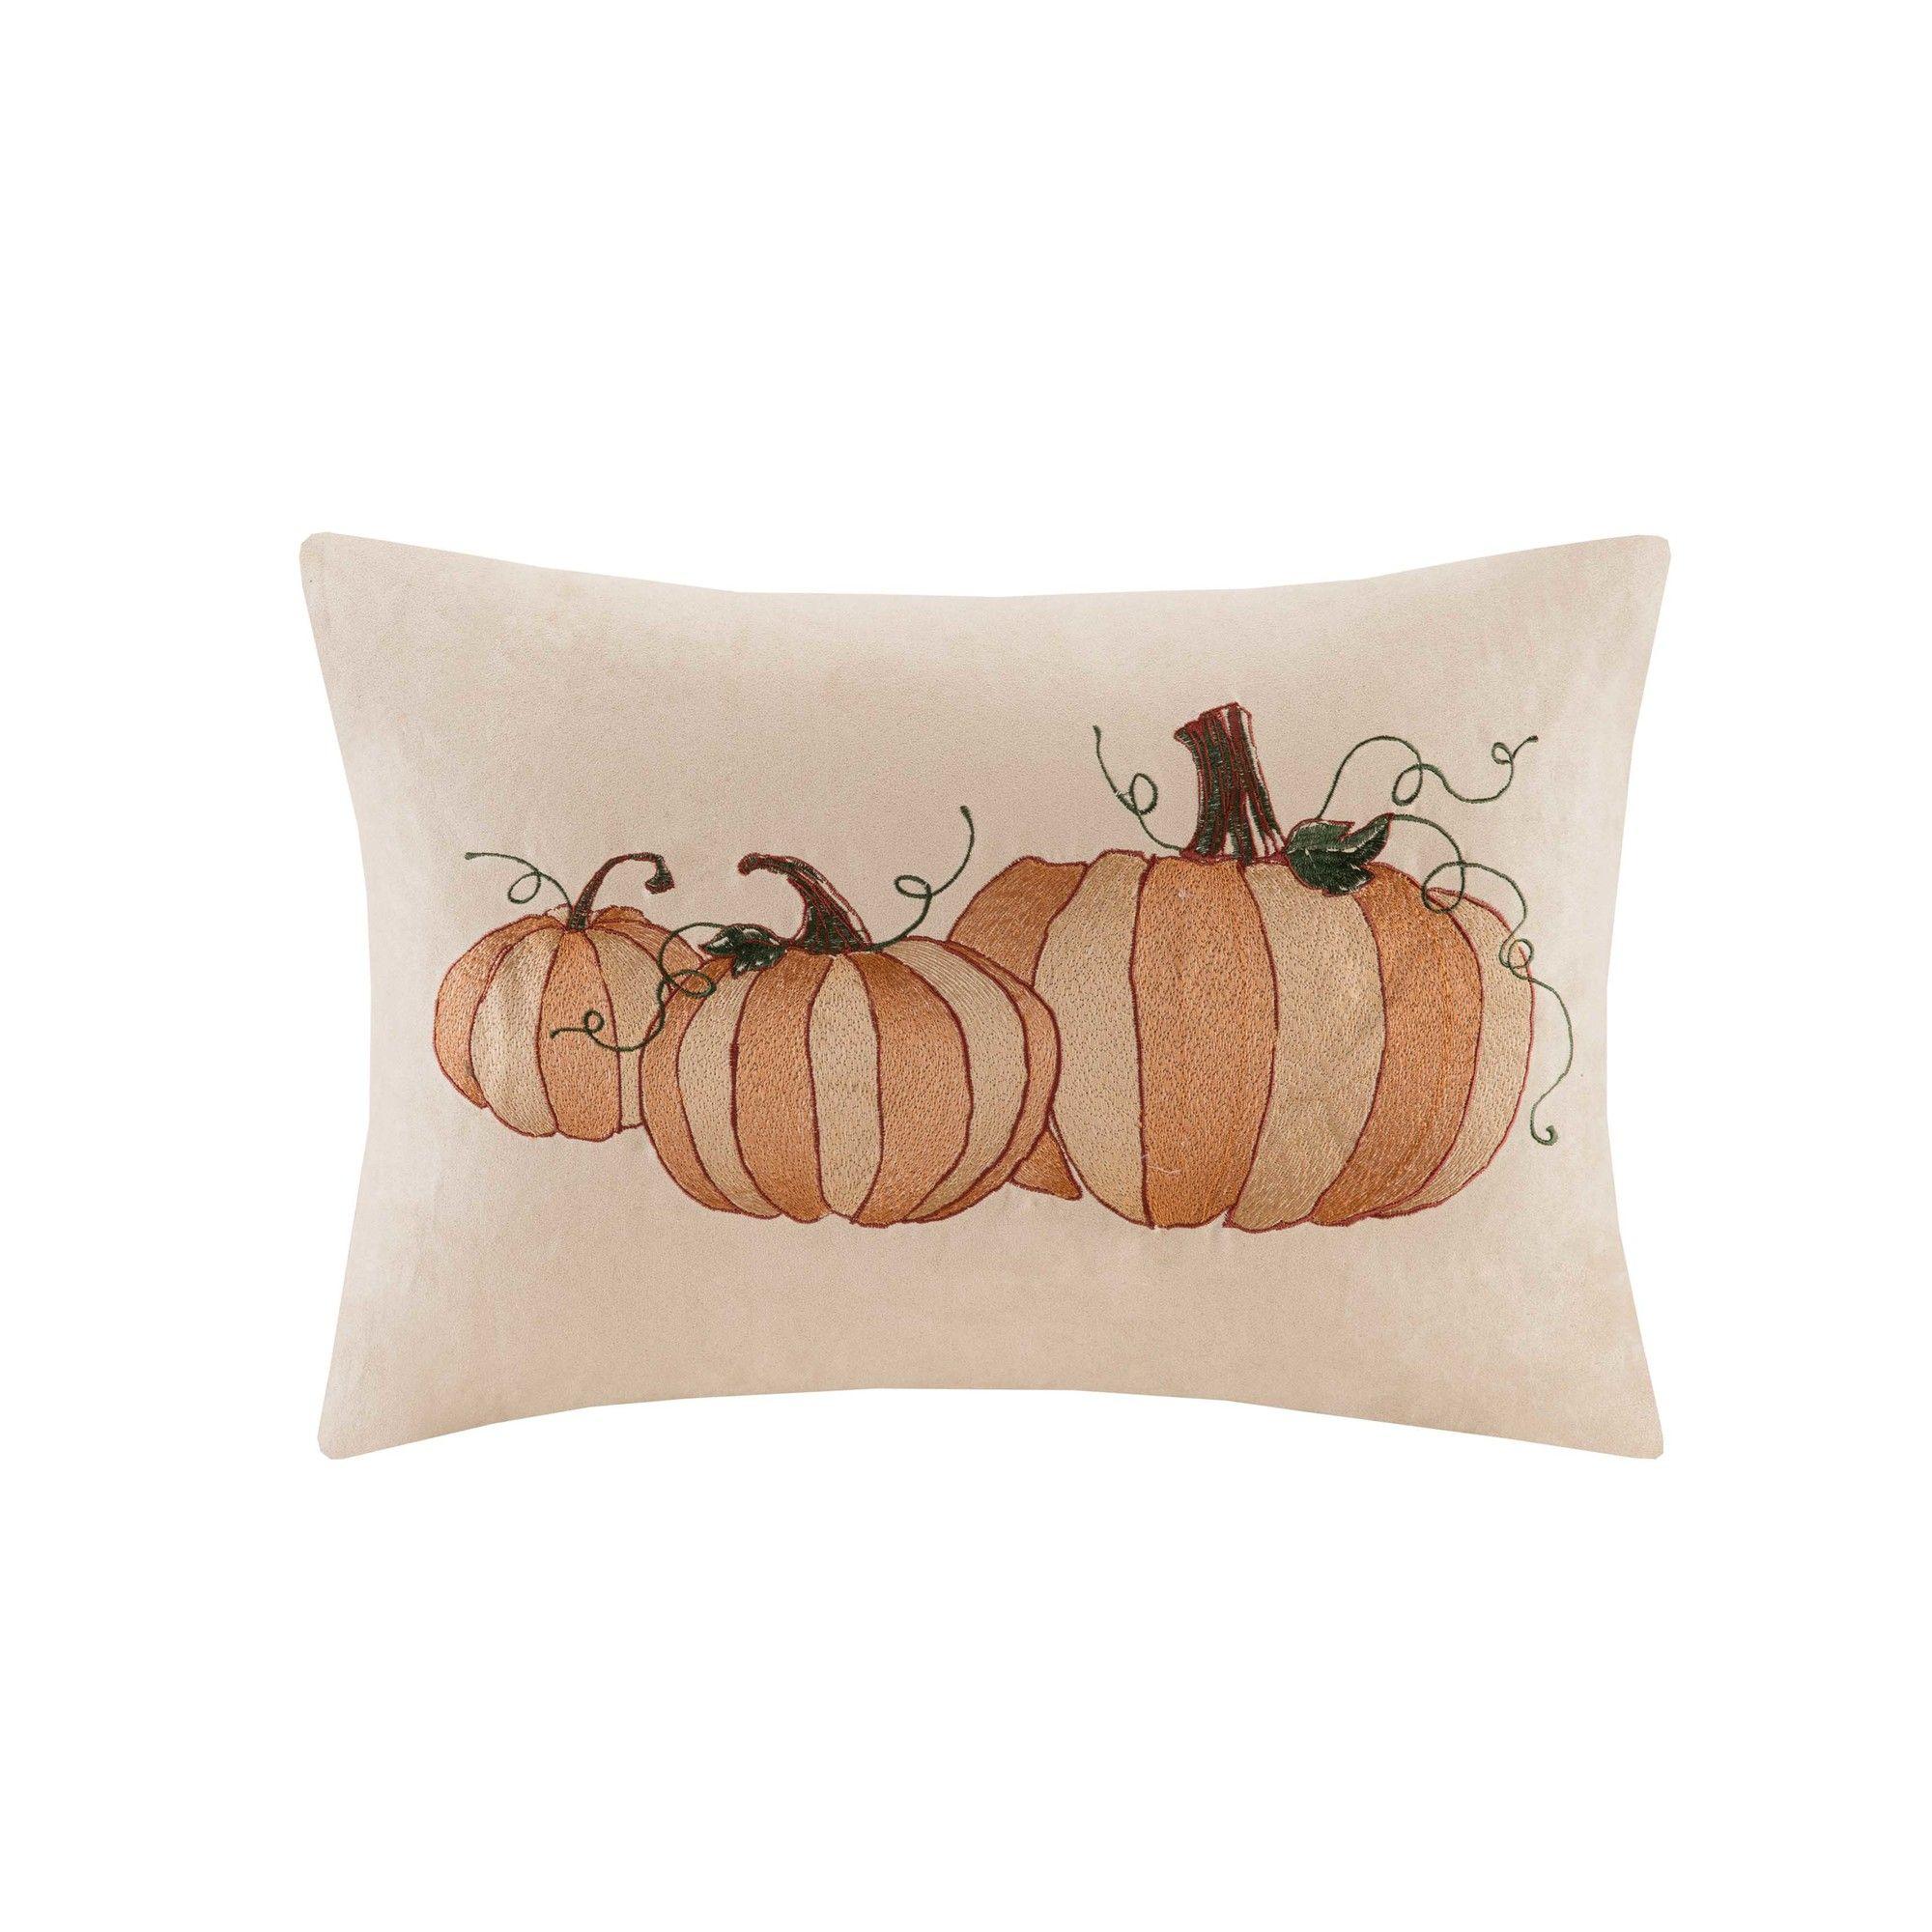 Pumpkin Embroidered Suede Lumbar Pillow